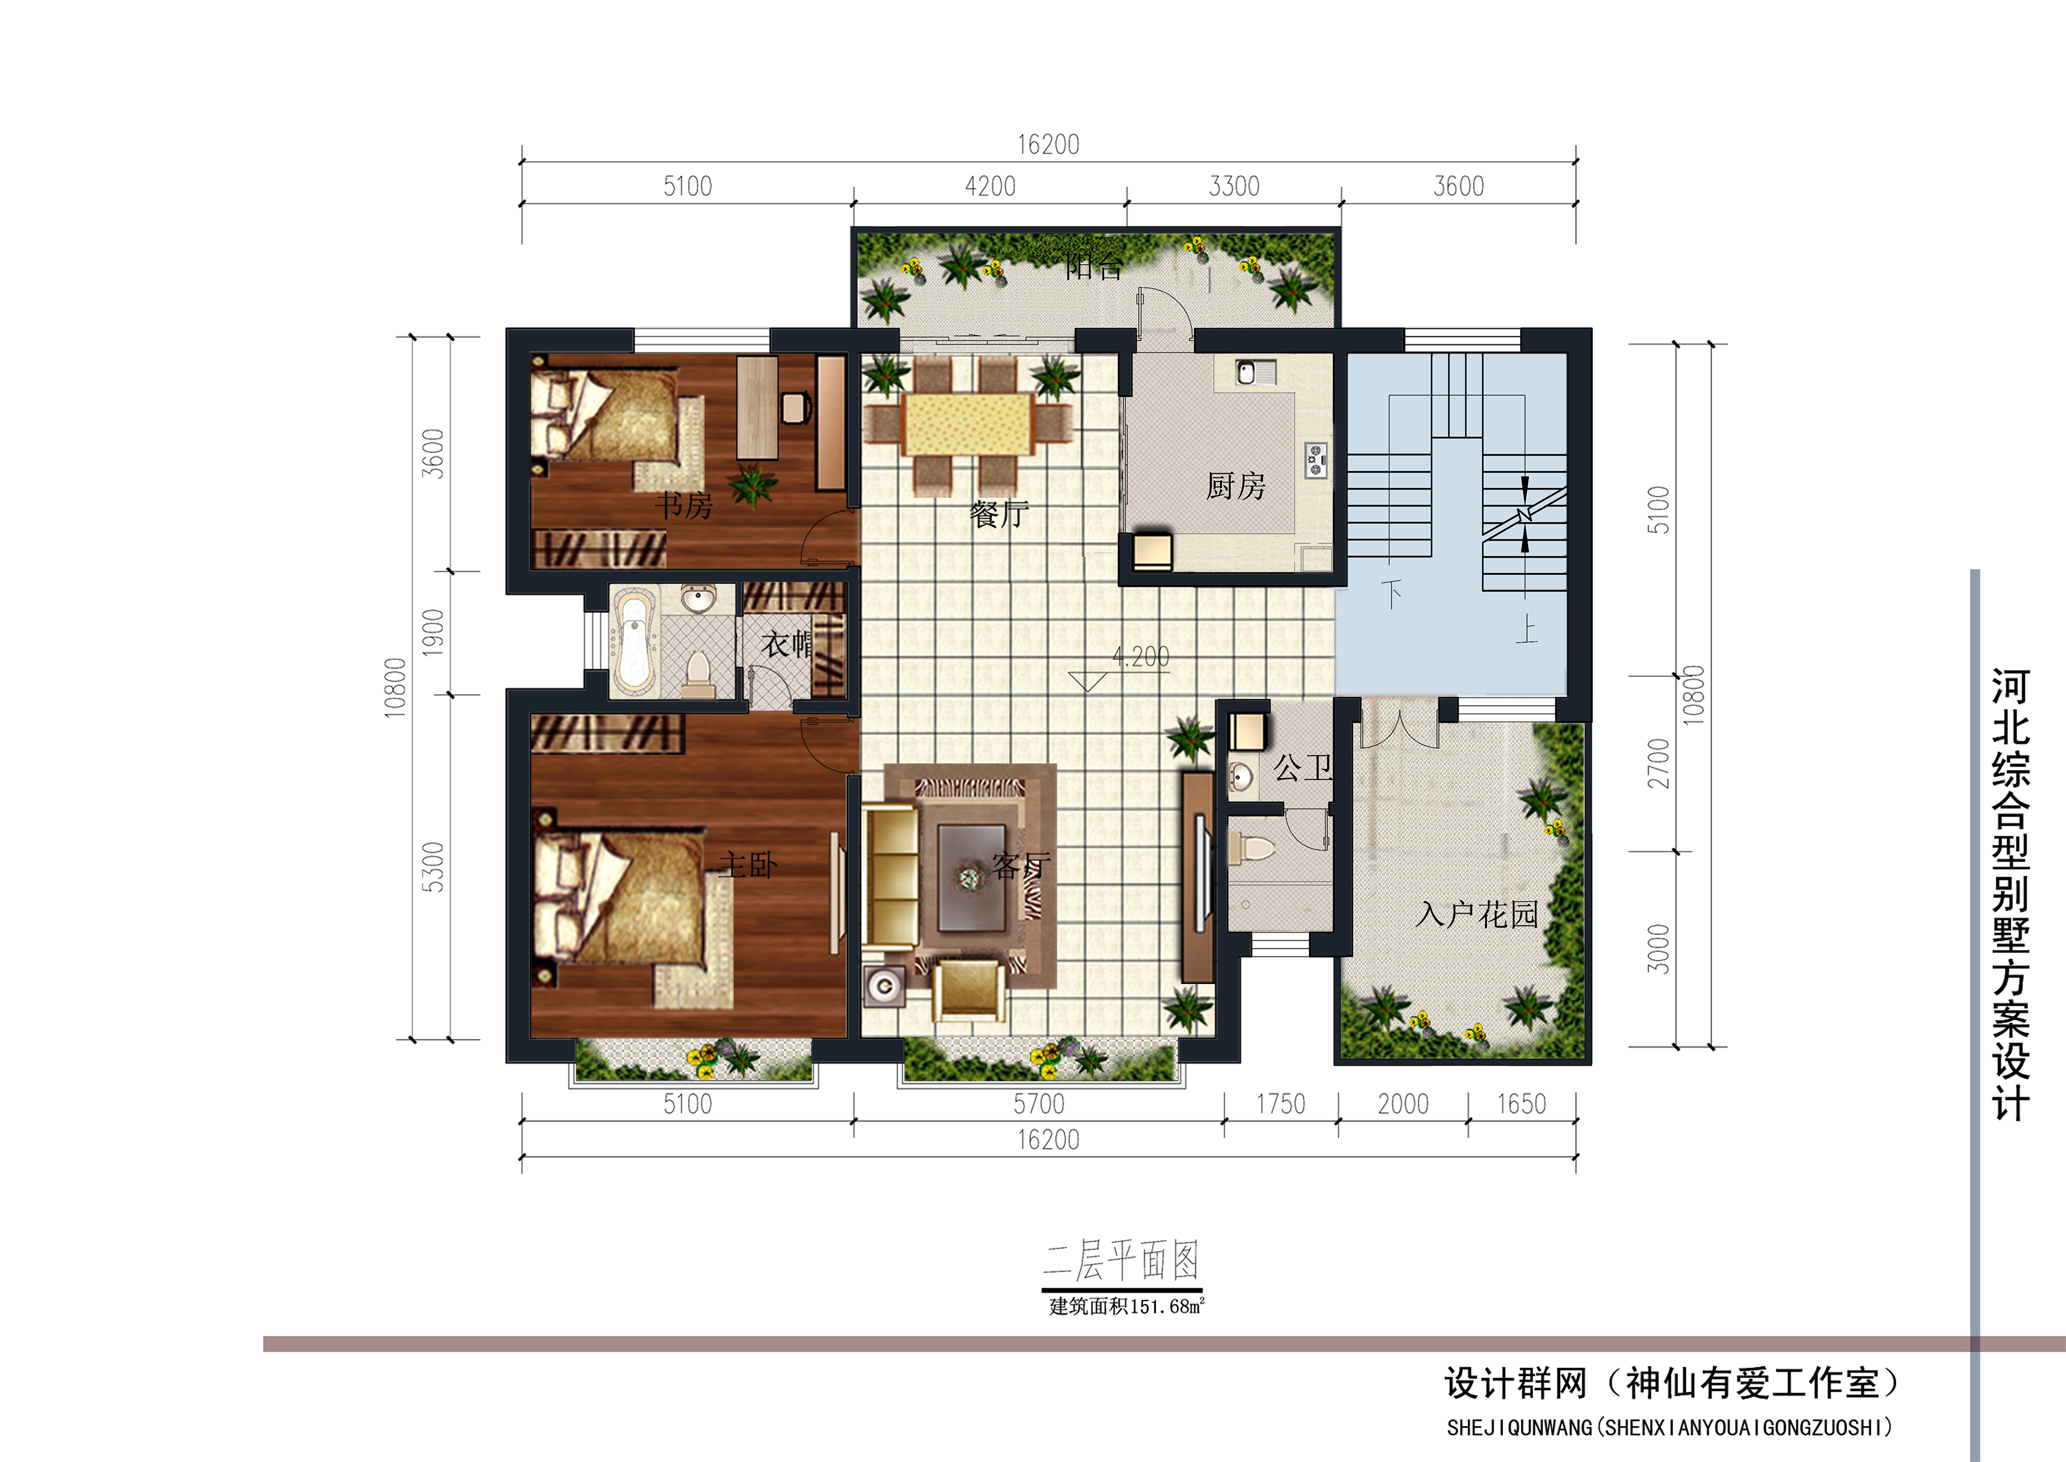 15x9米现代别墅设计图展示